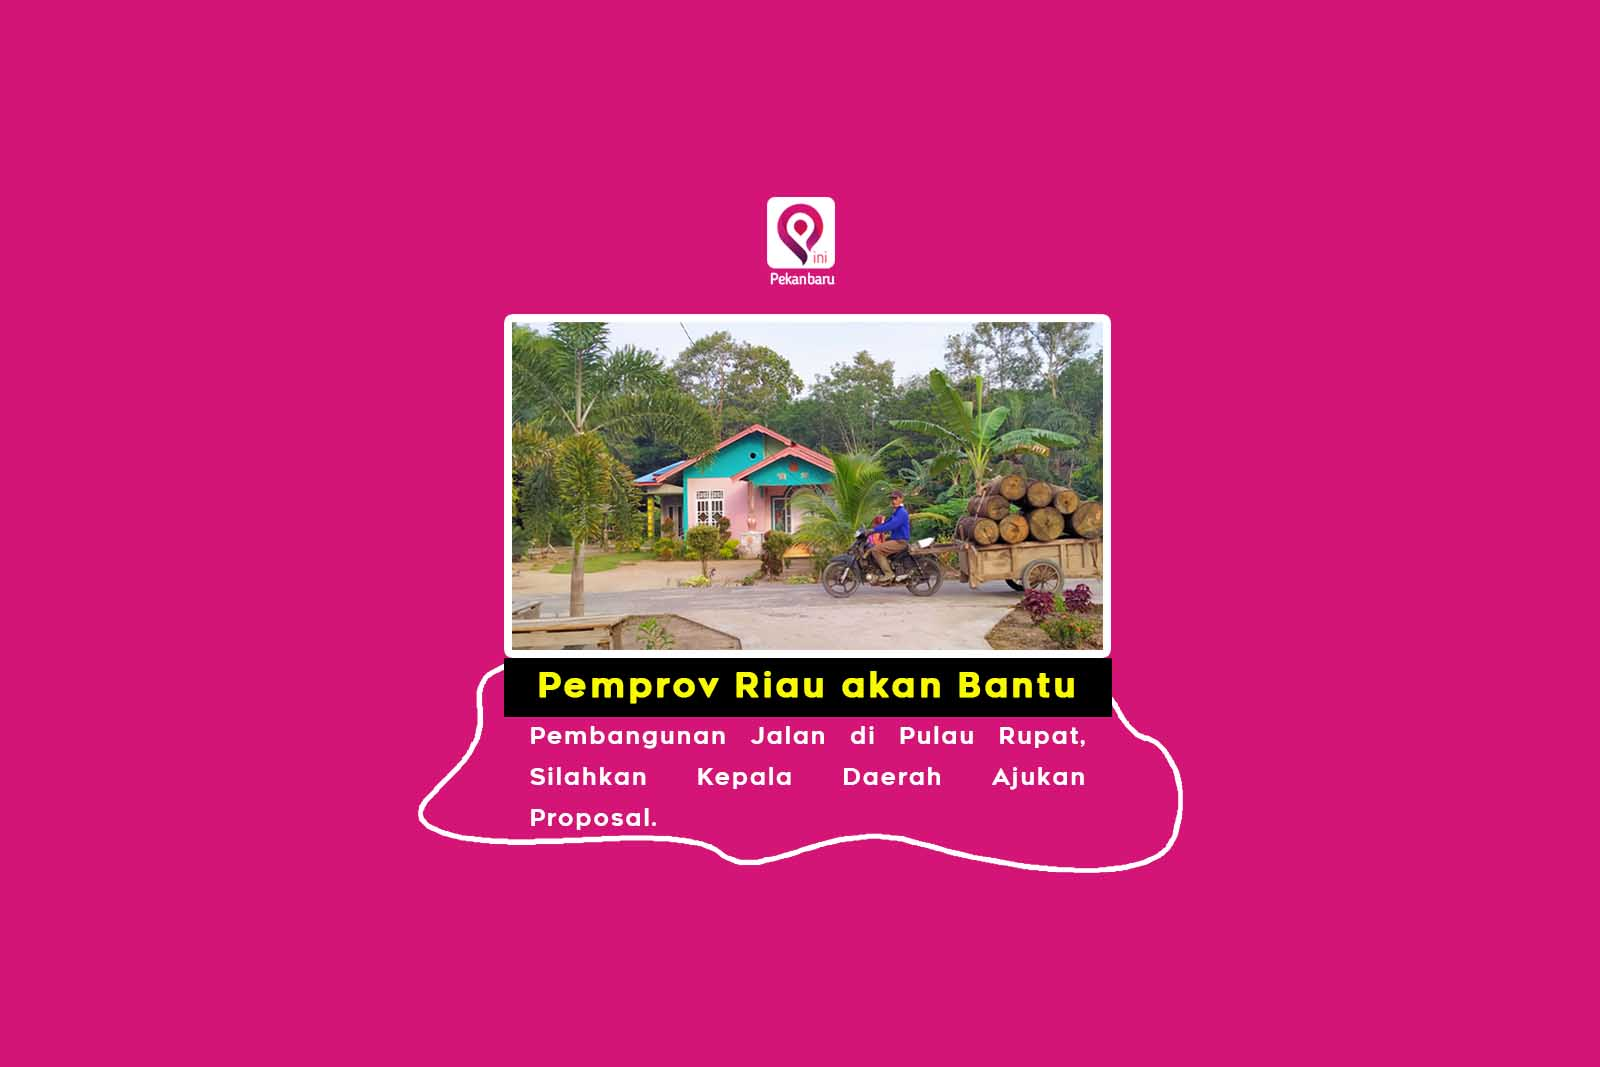 Pemprov Riau akan Bantu Pembangunan Jalan di Pulau Rupat, Silahkan Kepala Daerah Ajukan Proposal